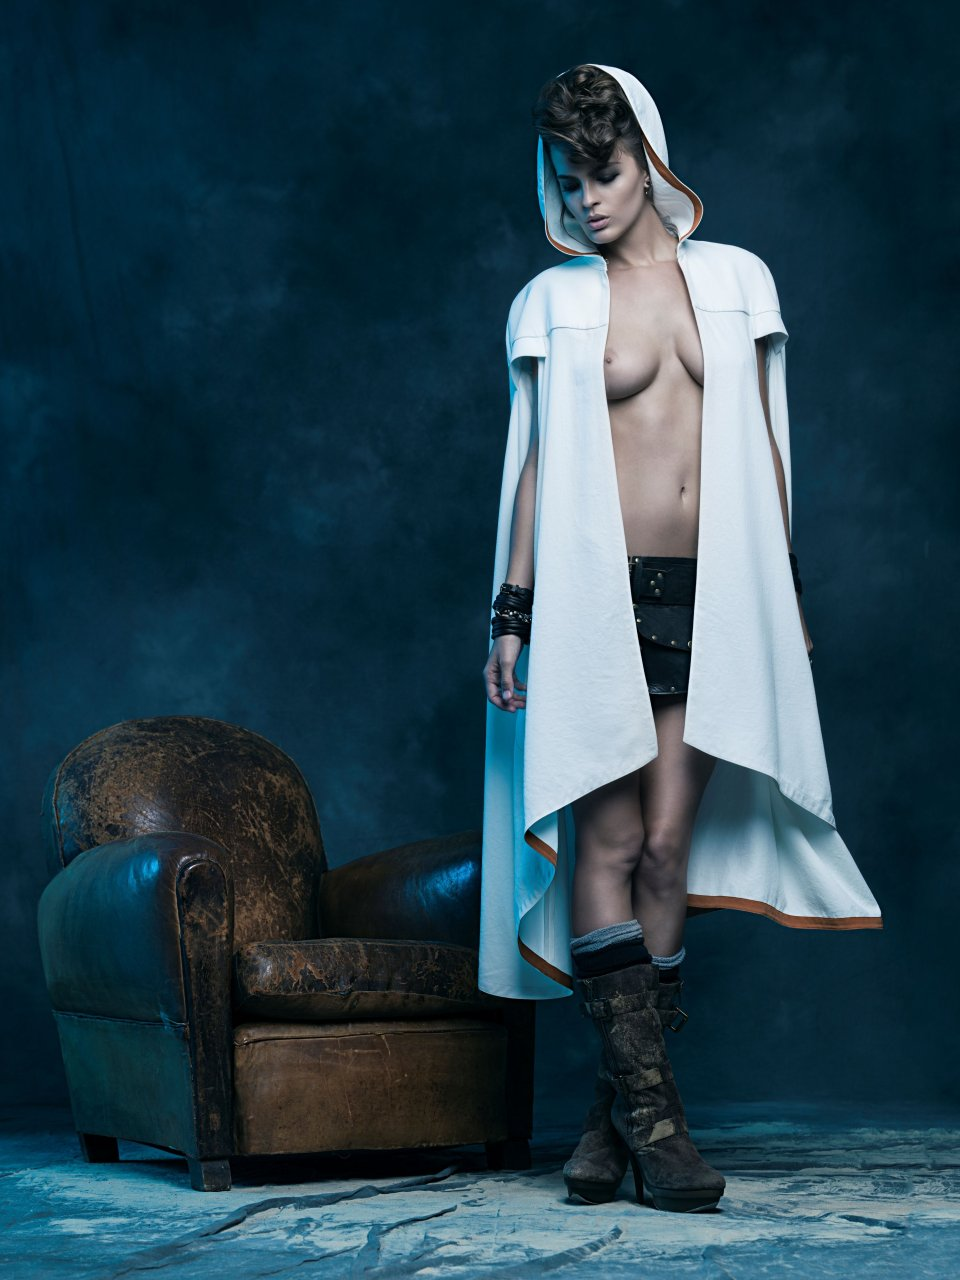 Katelyn-Pascavis-Sexy-Topless-2